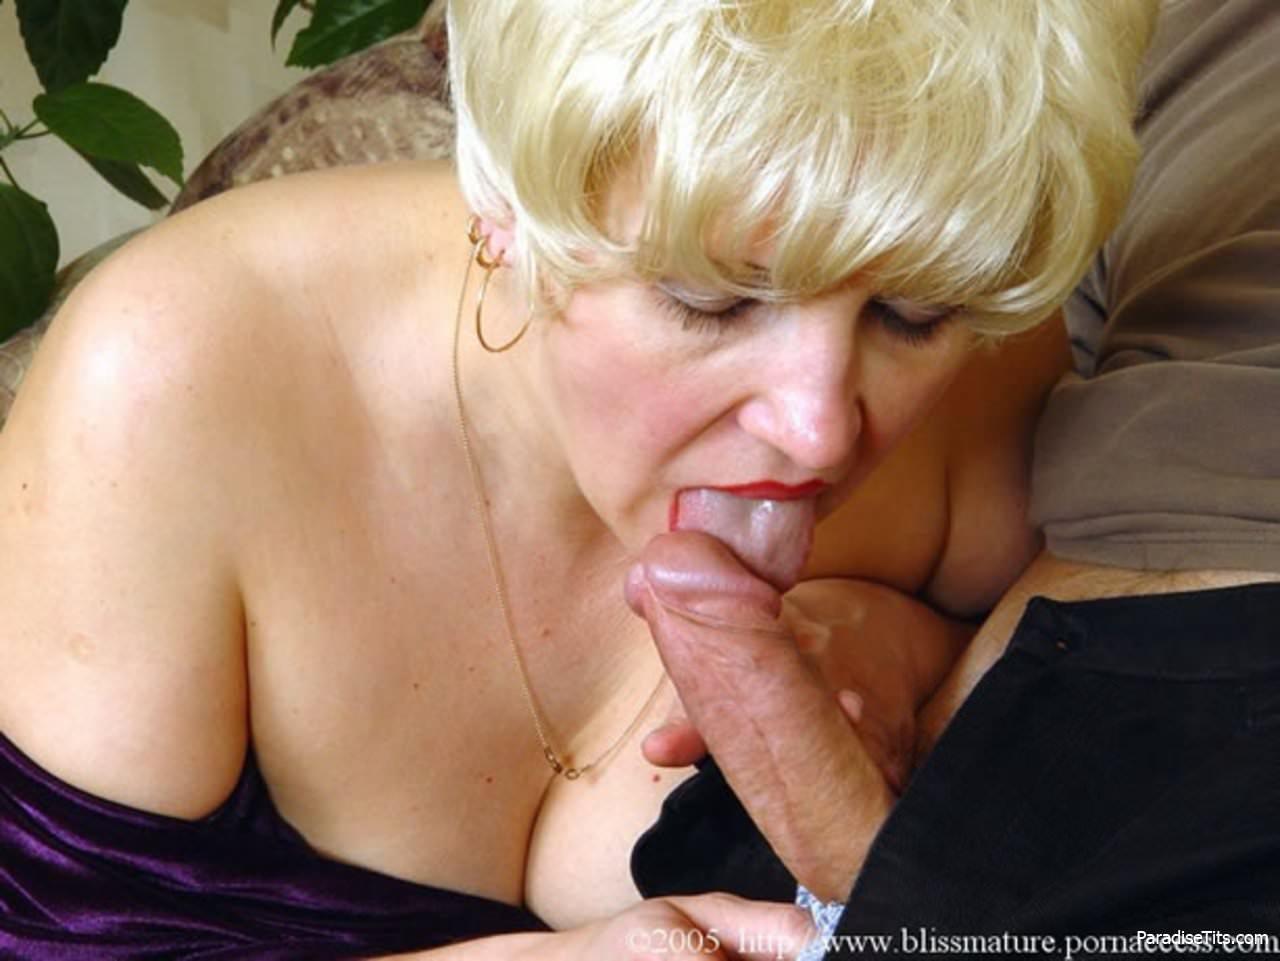 Зрелые женщина любит молодой член, секс дома киргизки видео